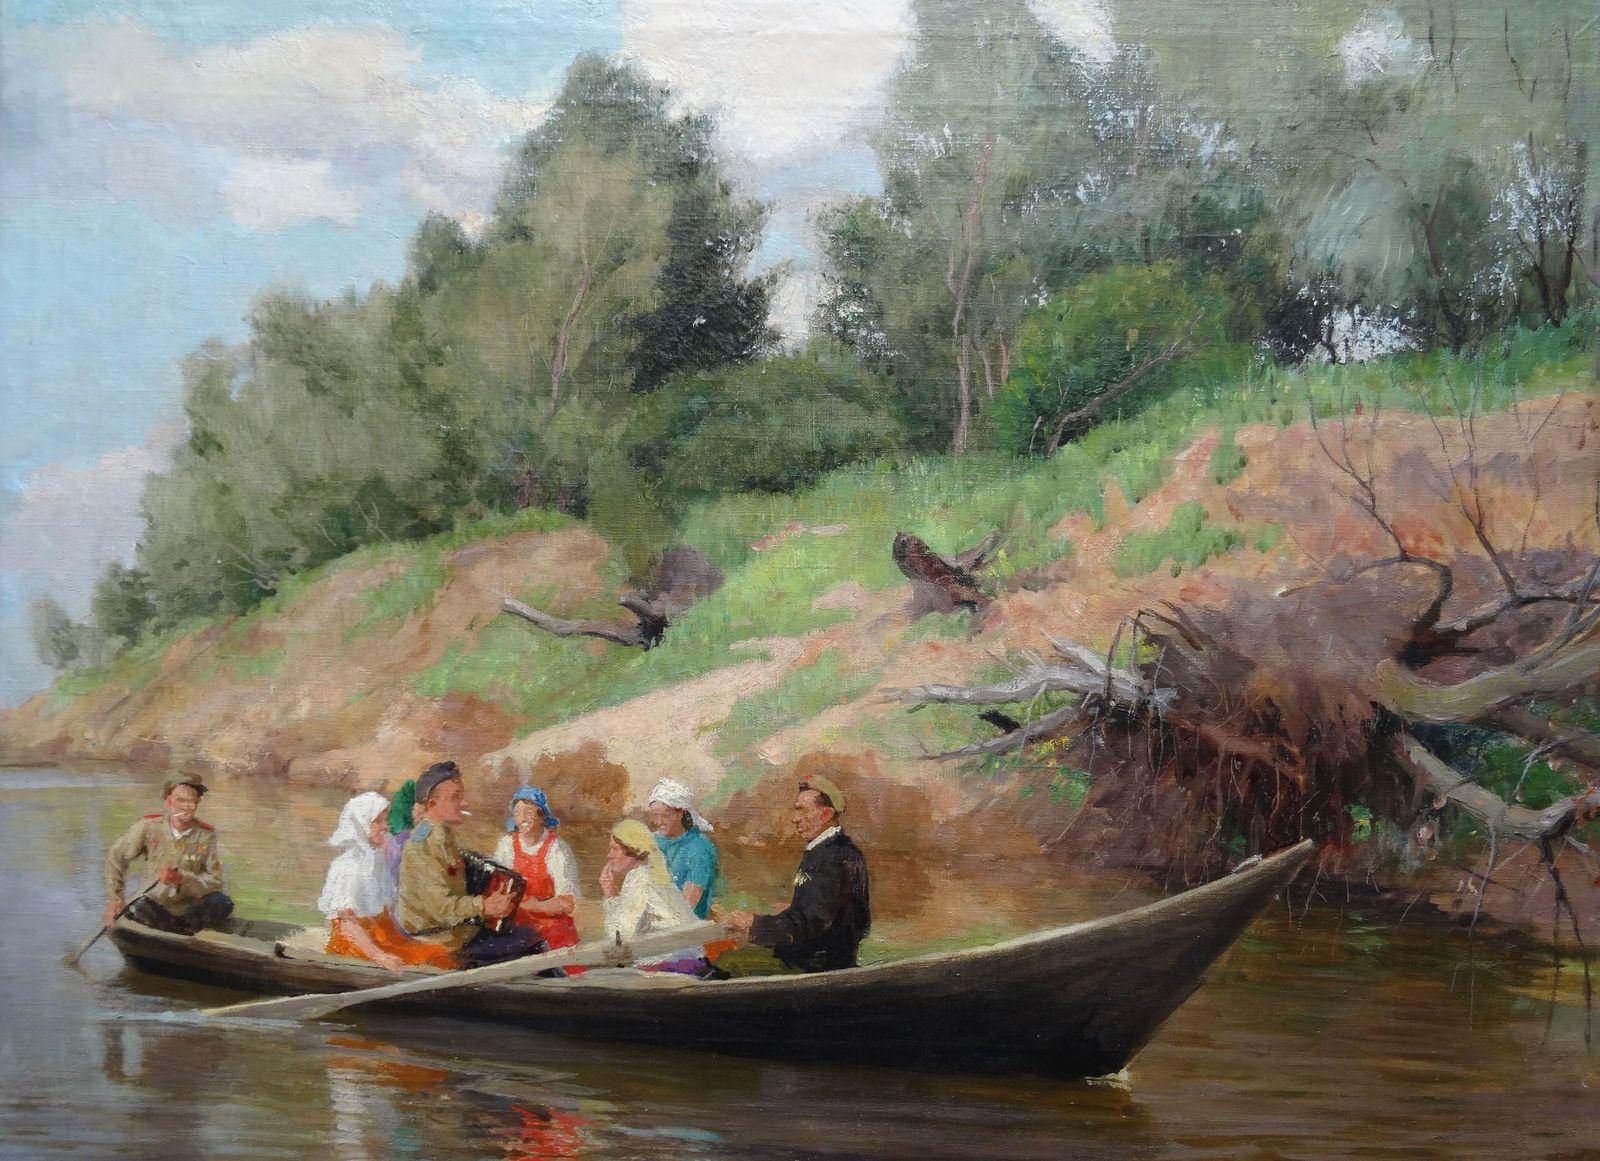 Spring. 1976. Canvas, oil, 57.5x77.5 cm